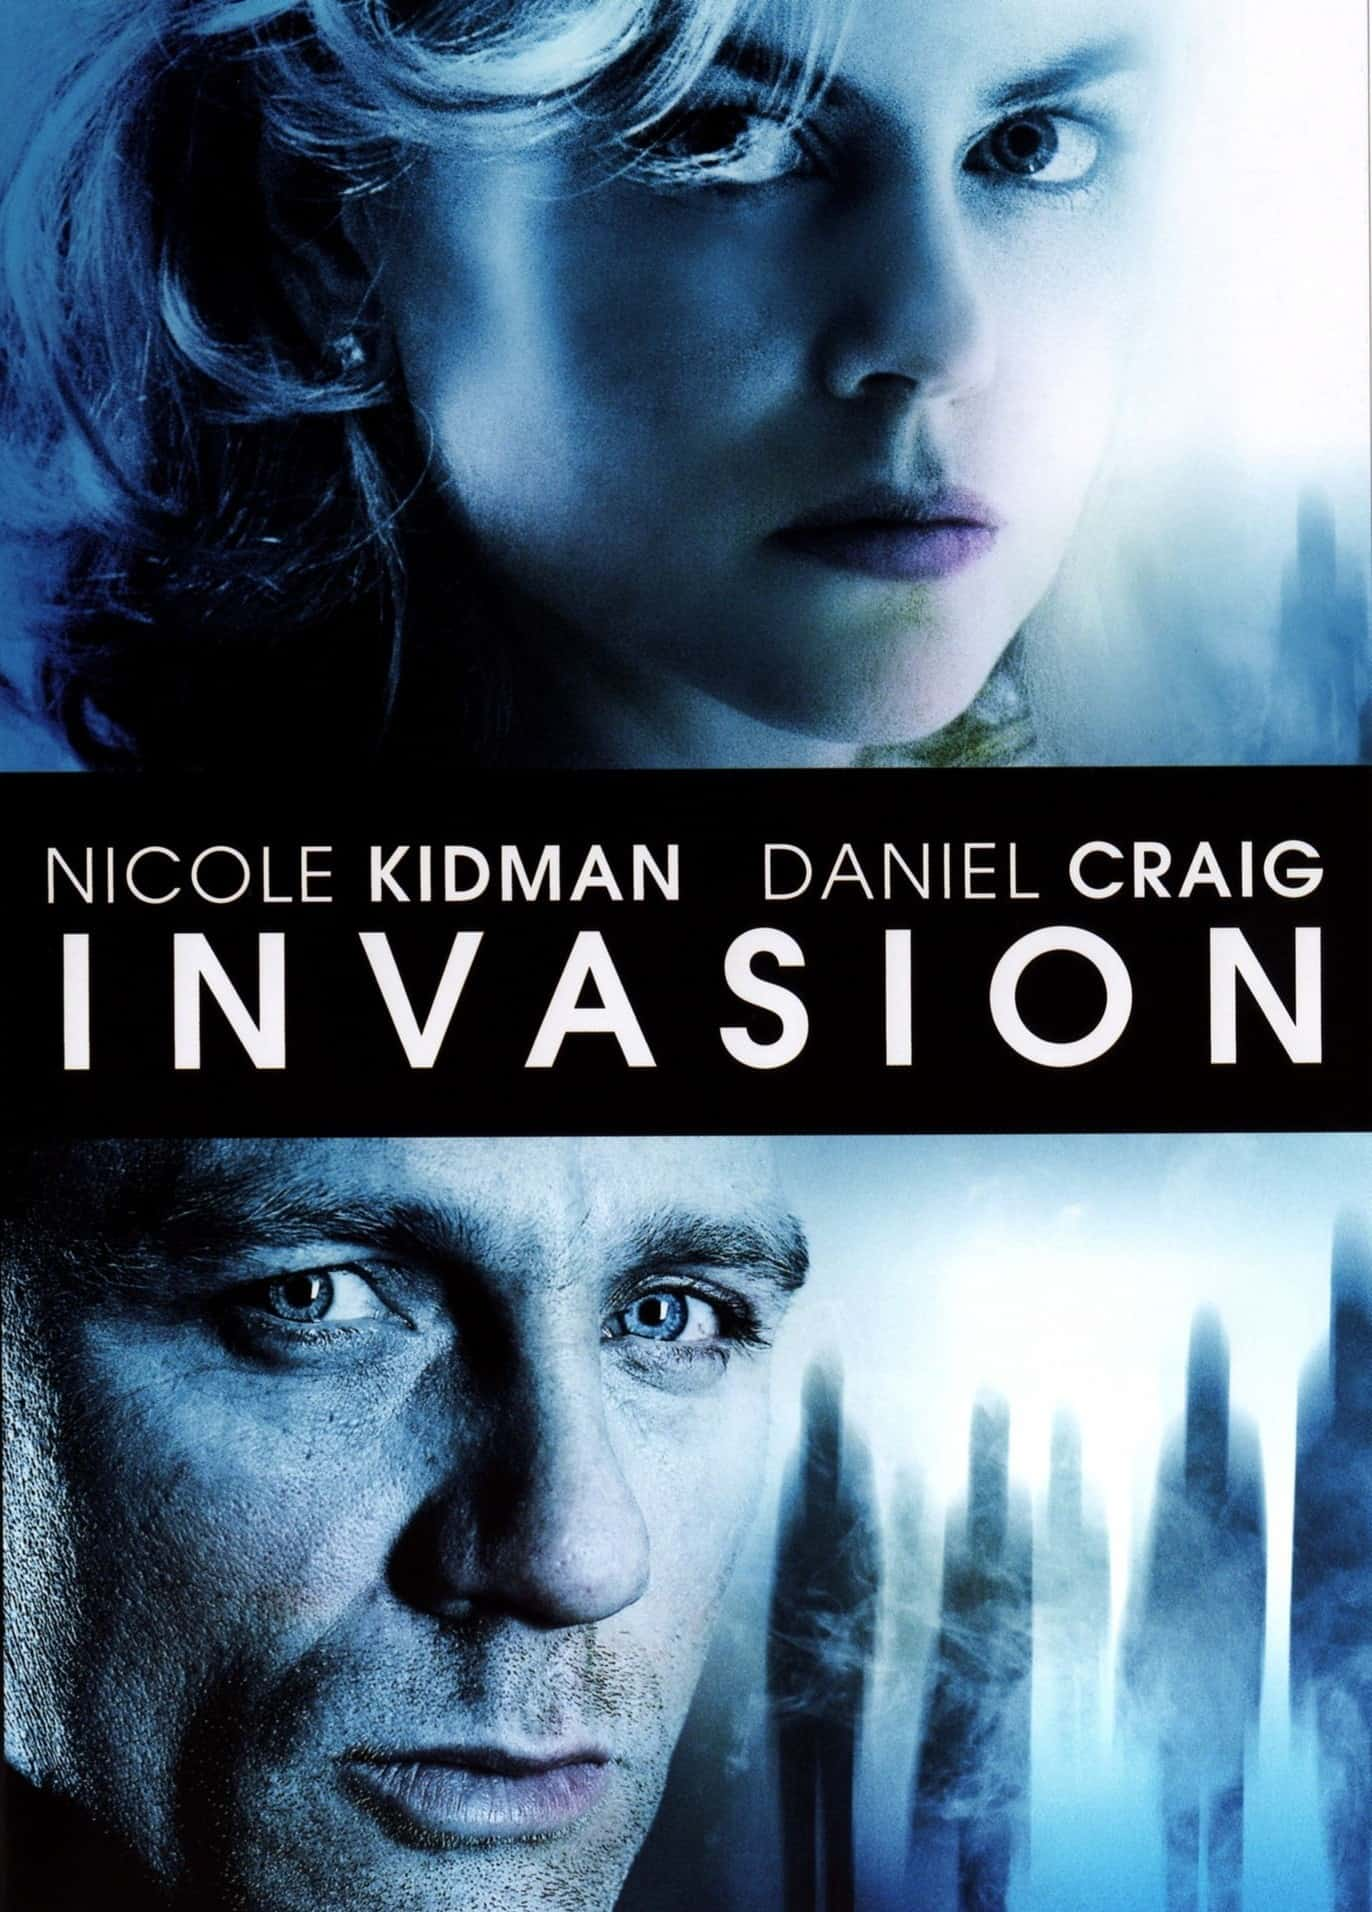 The Invasion, 2007